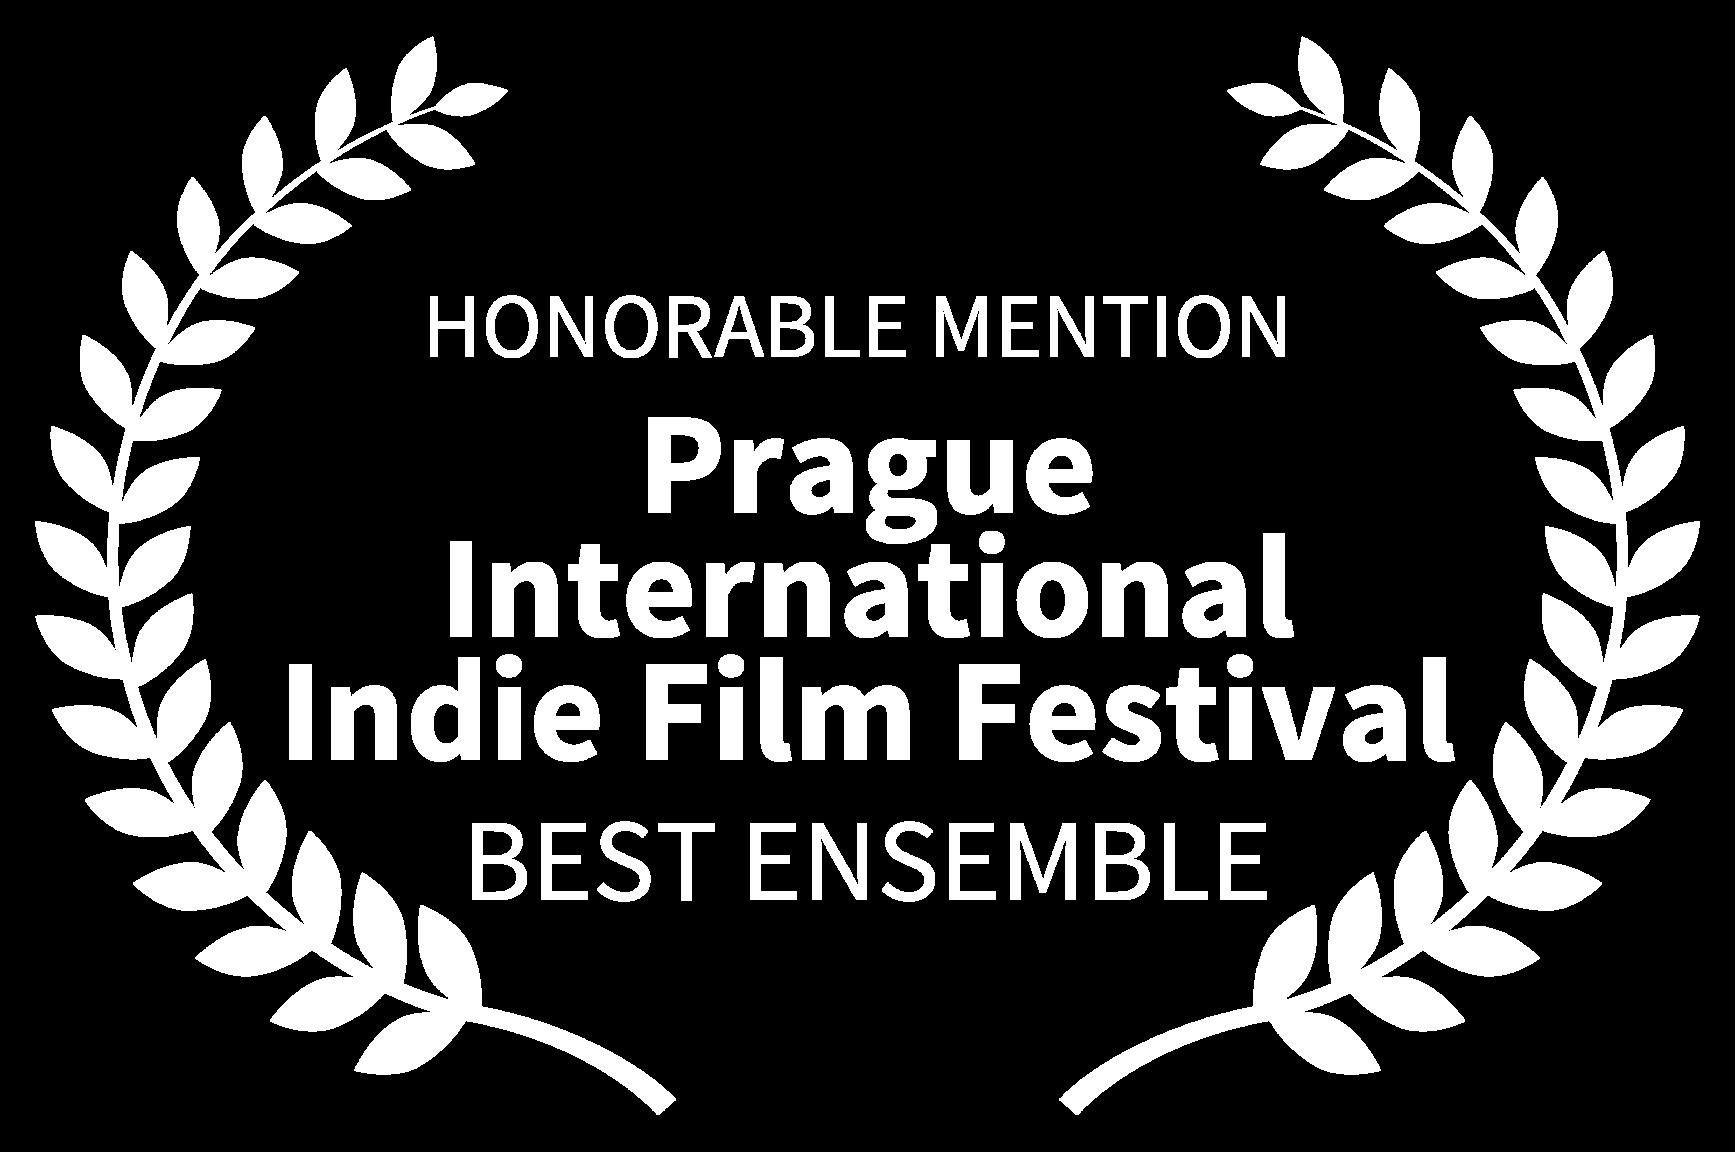 HONORABLE MENTION - Prague International Indie Film Festival - BEST ENSEMBLE